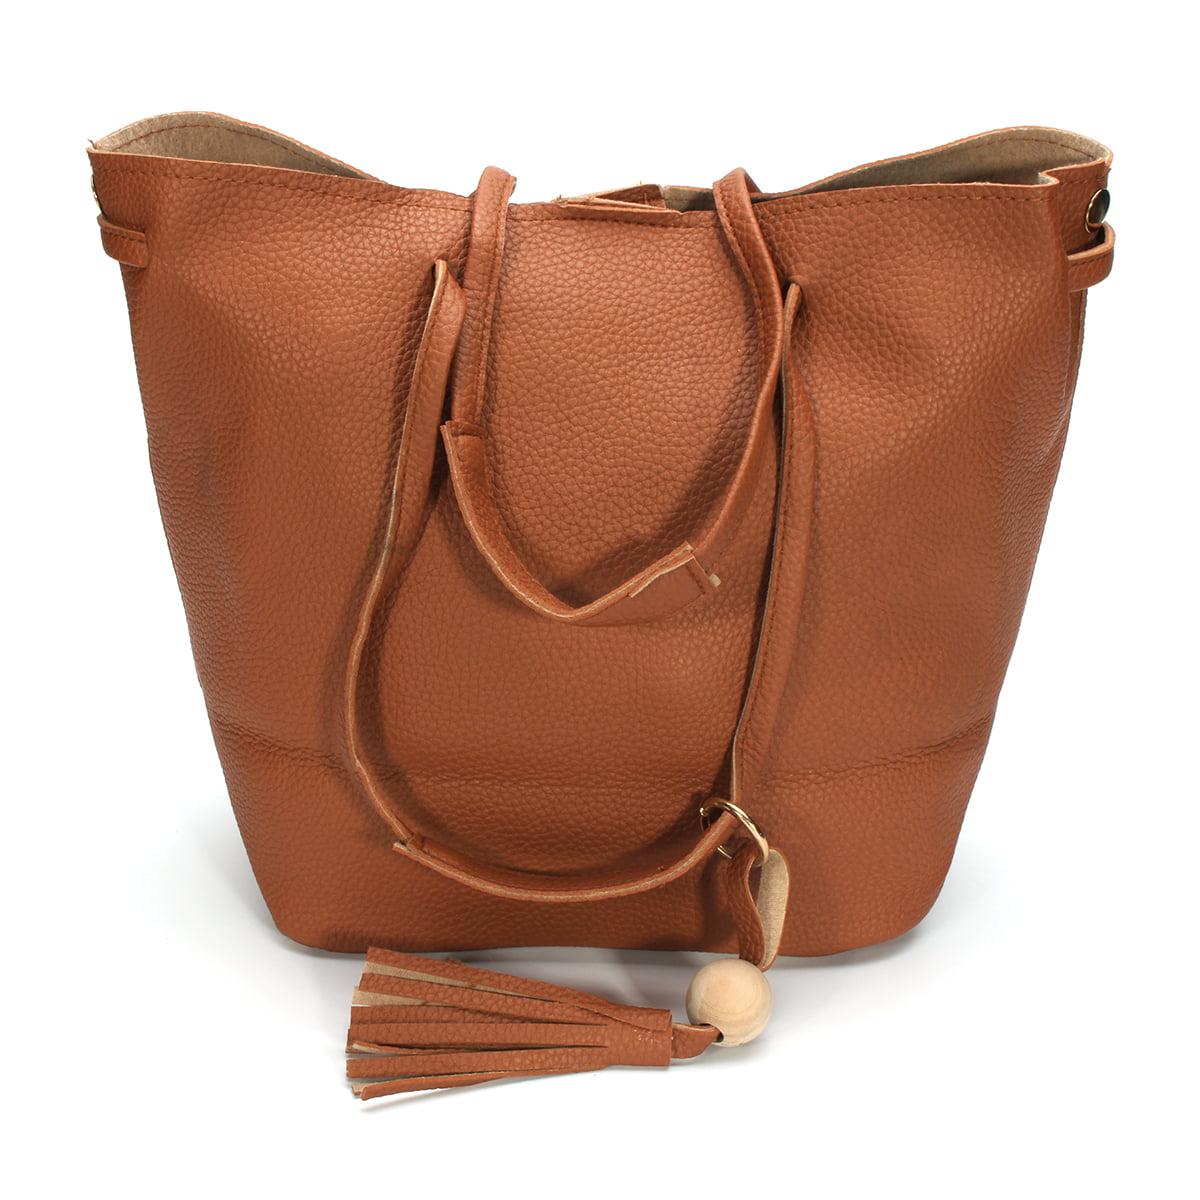 4PCS Women Clutch PU Leather Handbag Shoulder Bag Tote Purse Messenger